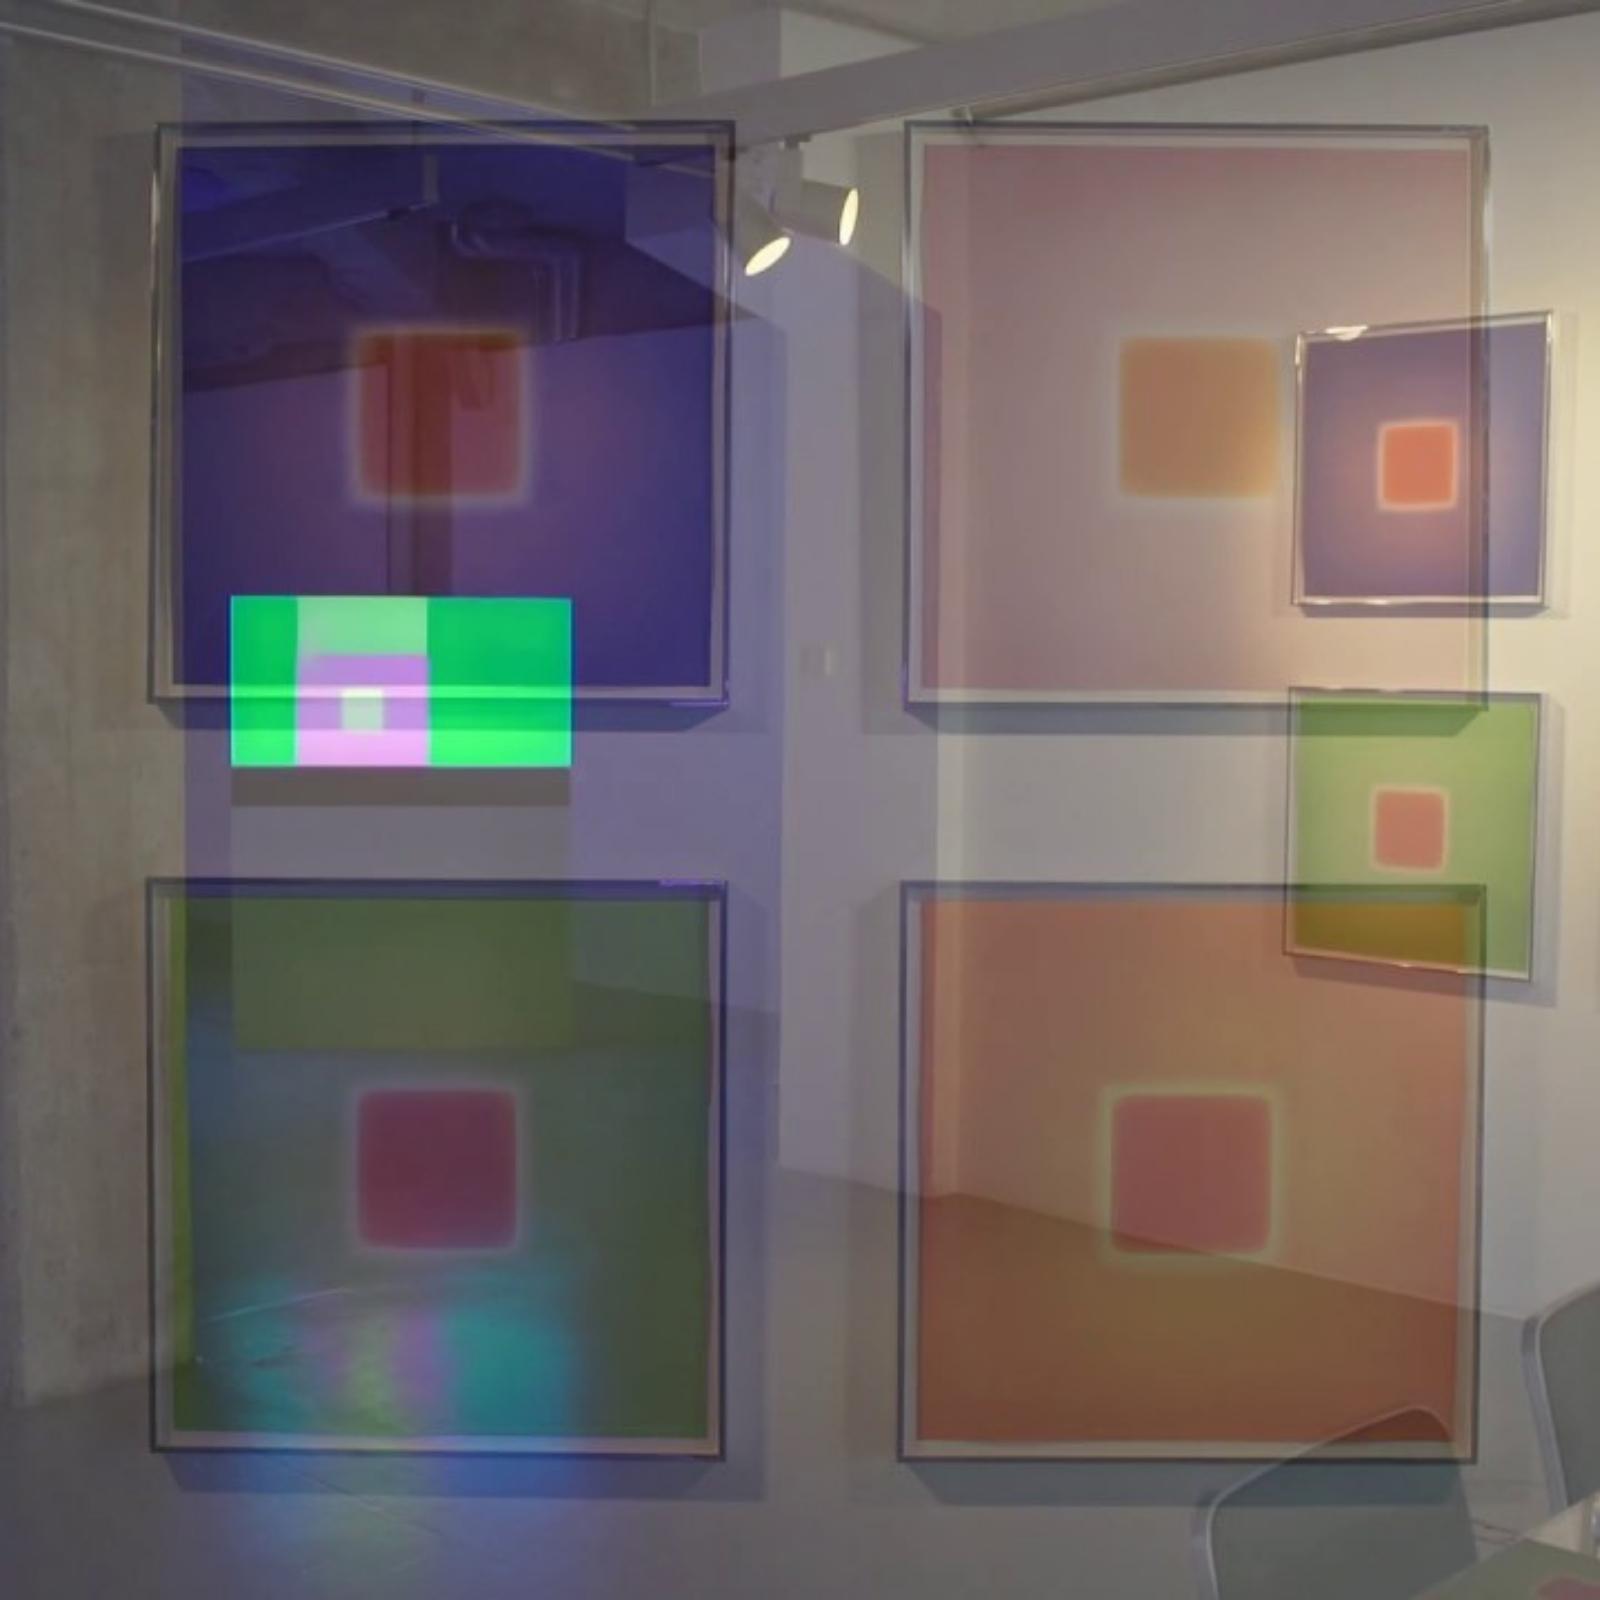 Brian Eno video